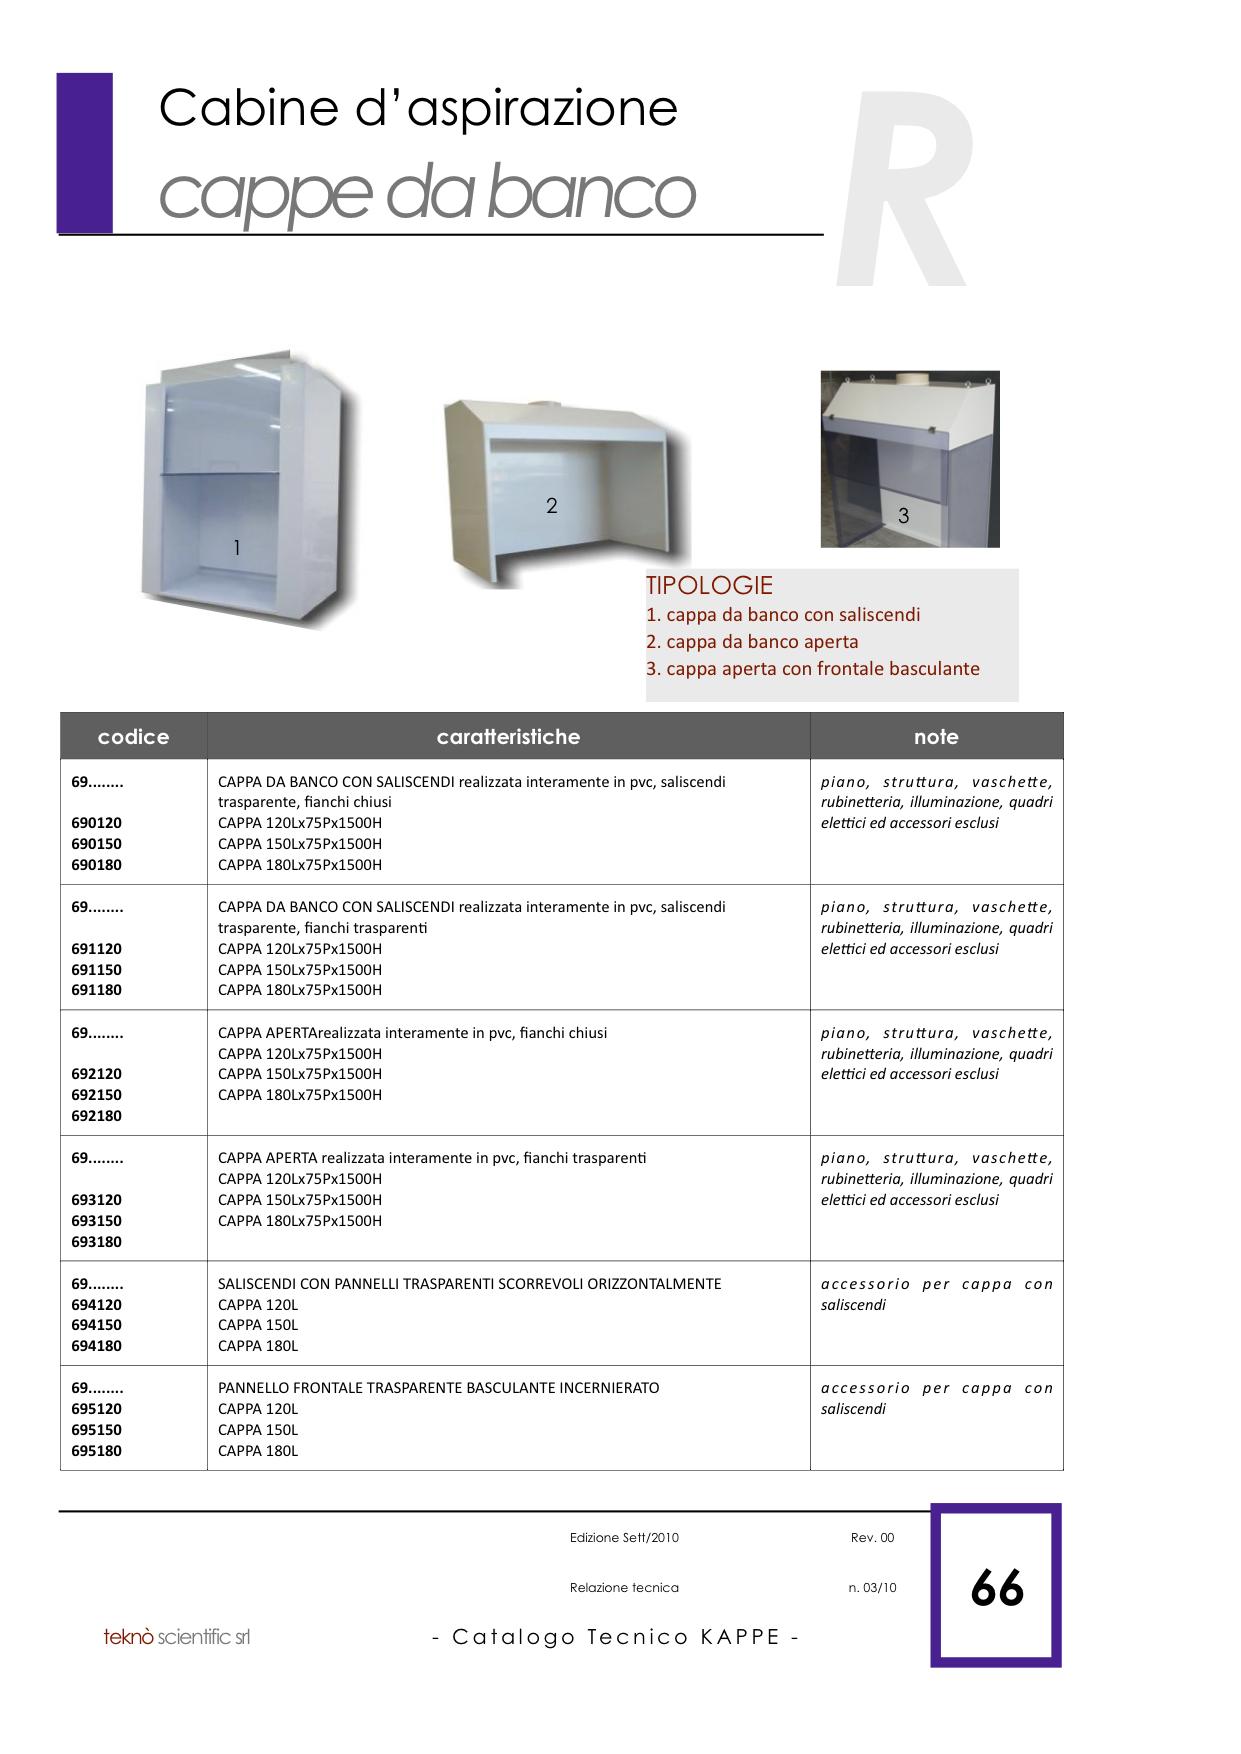 KAPPE Catalogo Tecnico Generale copia 6.png